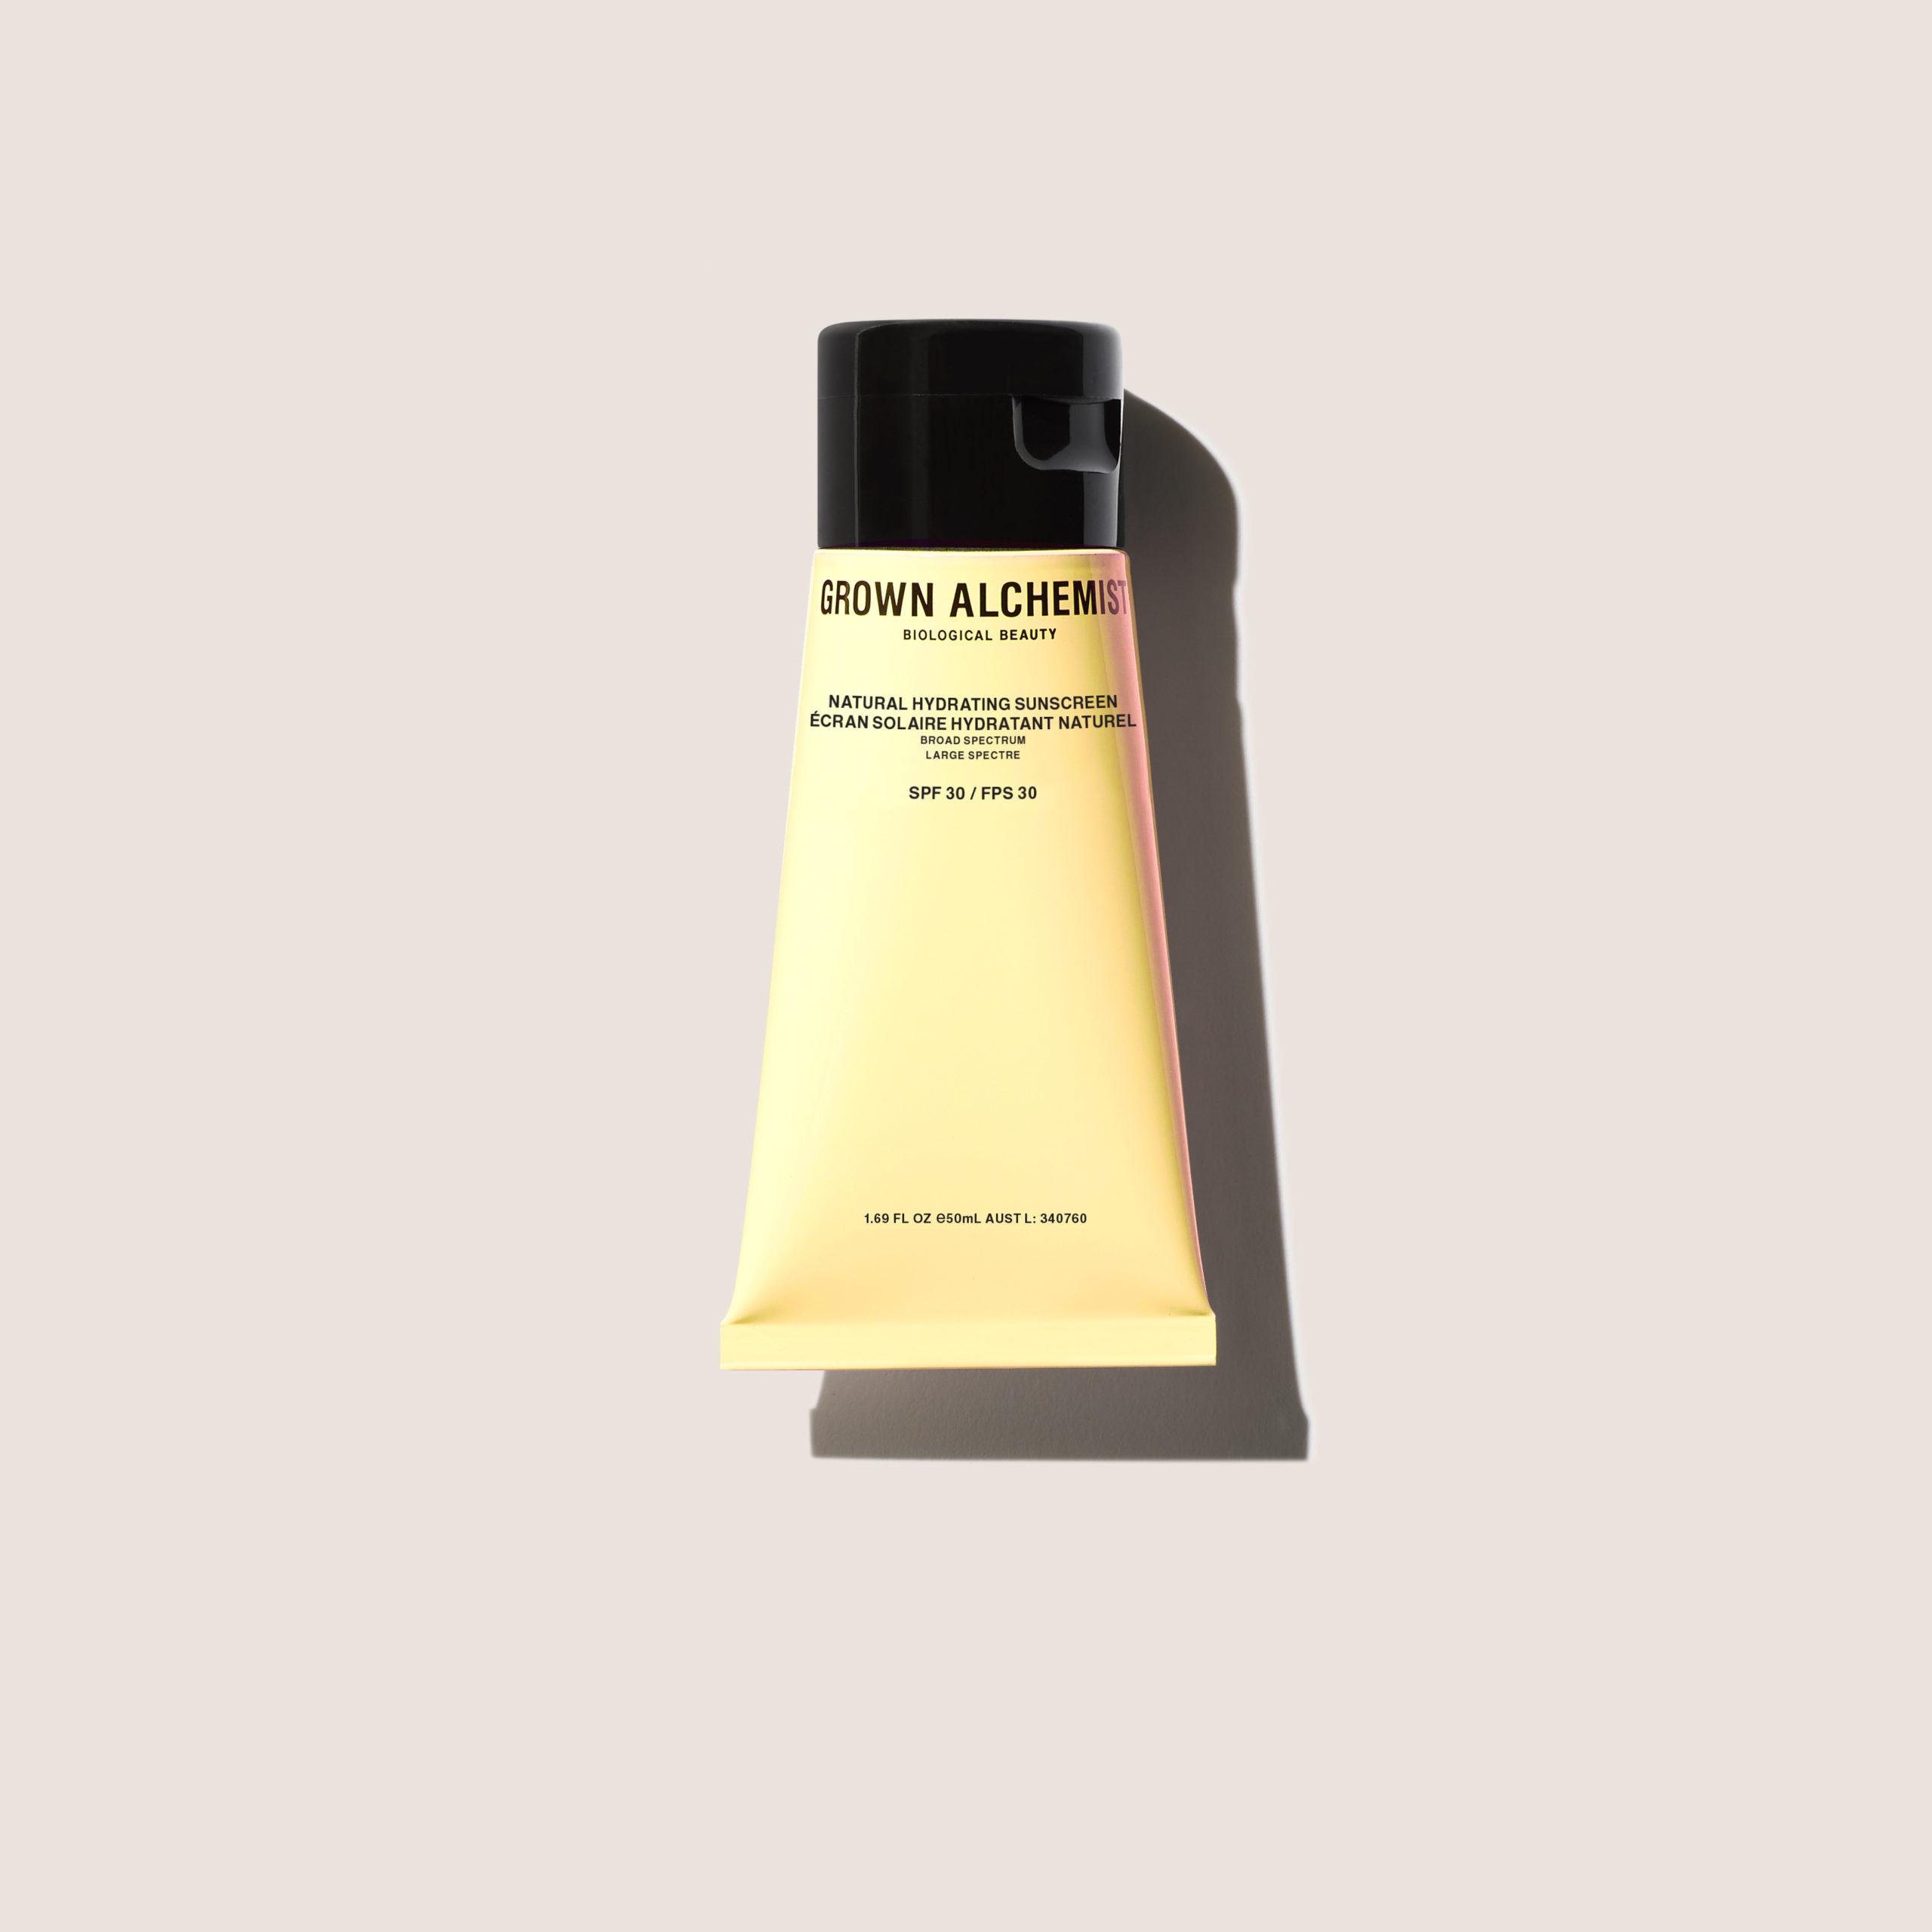 Natural Hydrating Sunscreen SPF-30